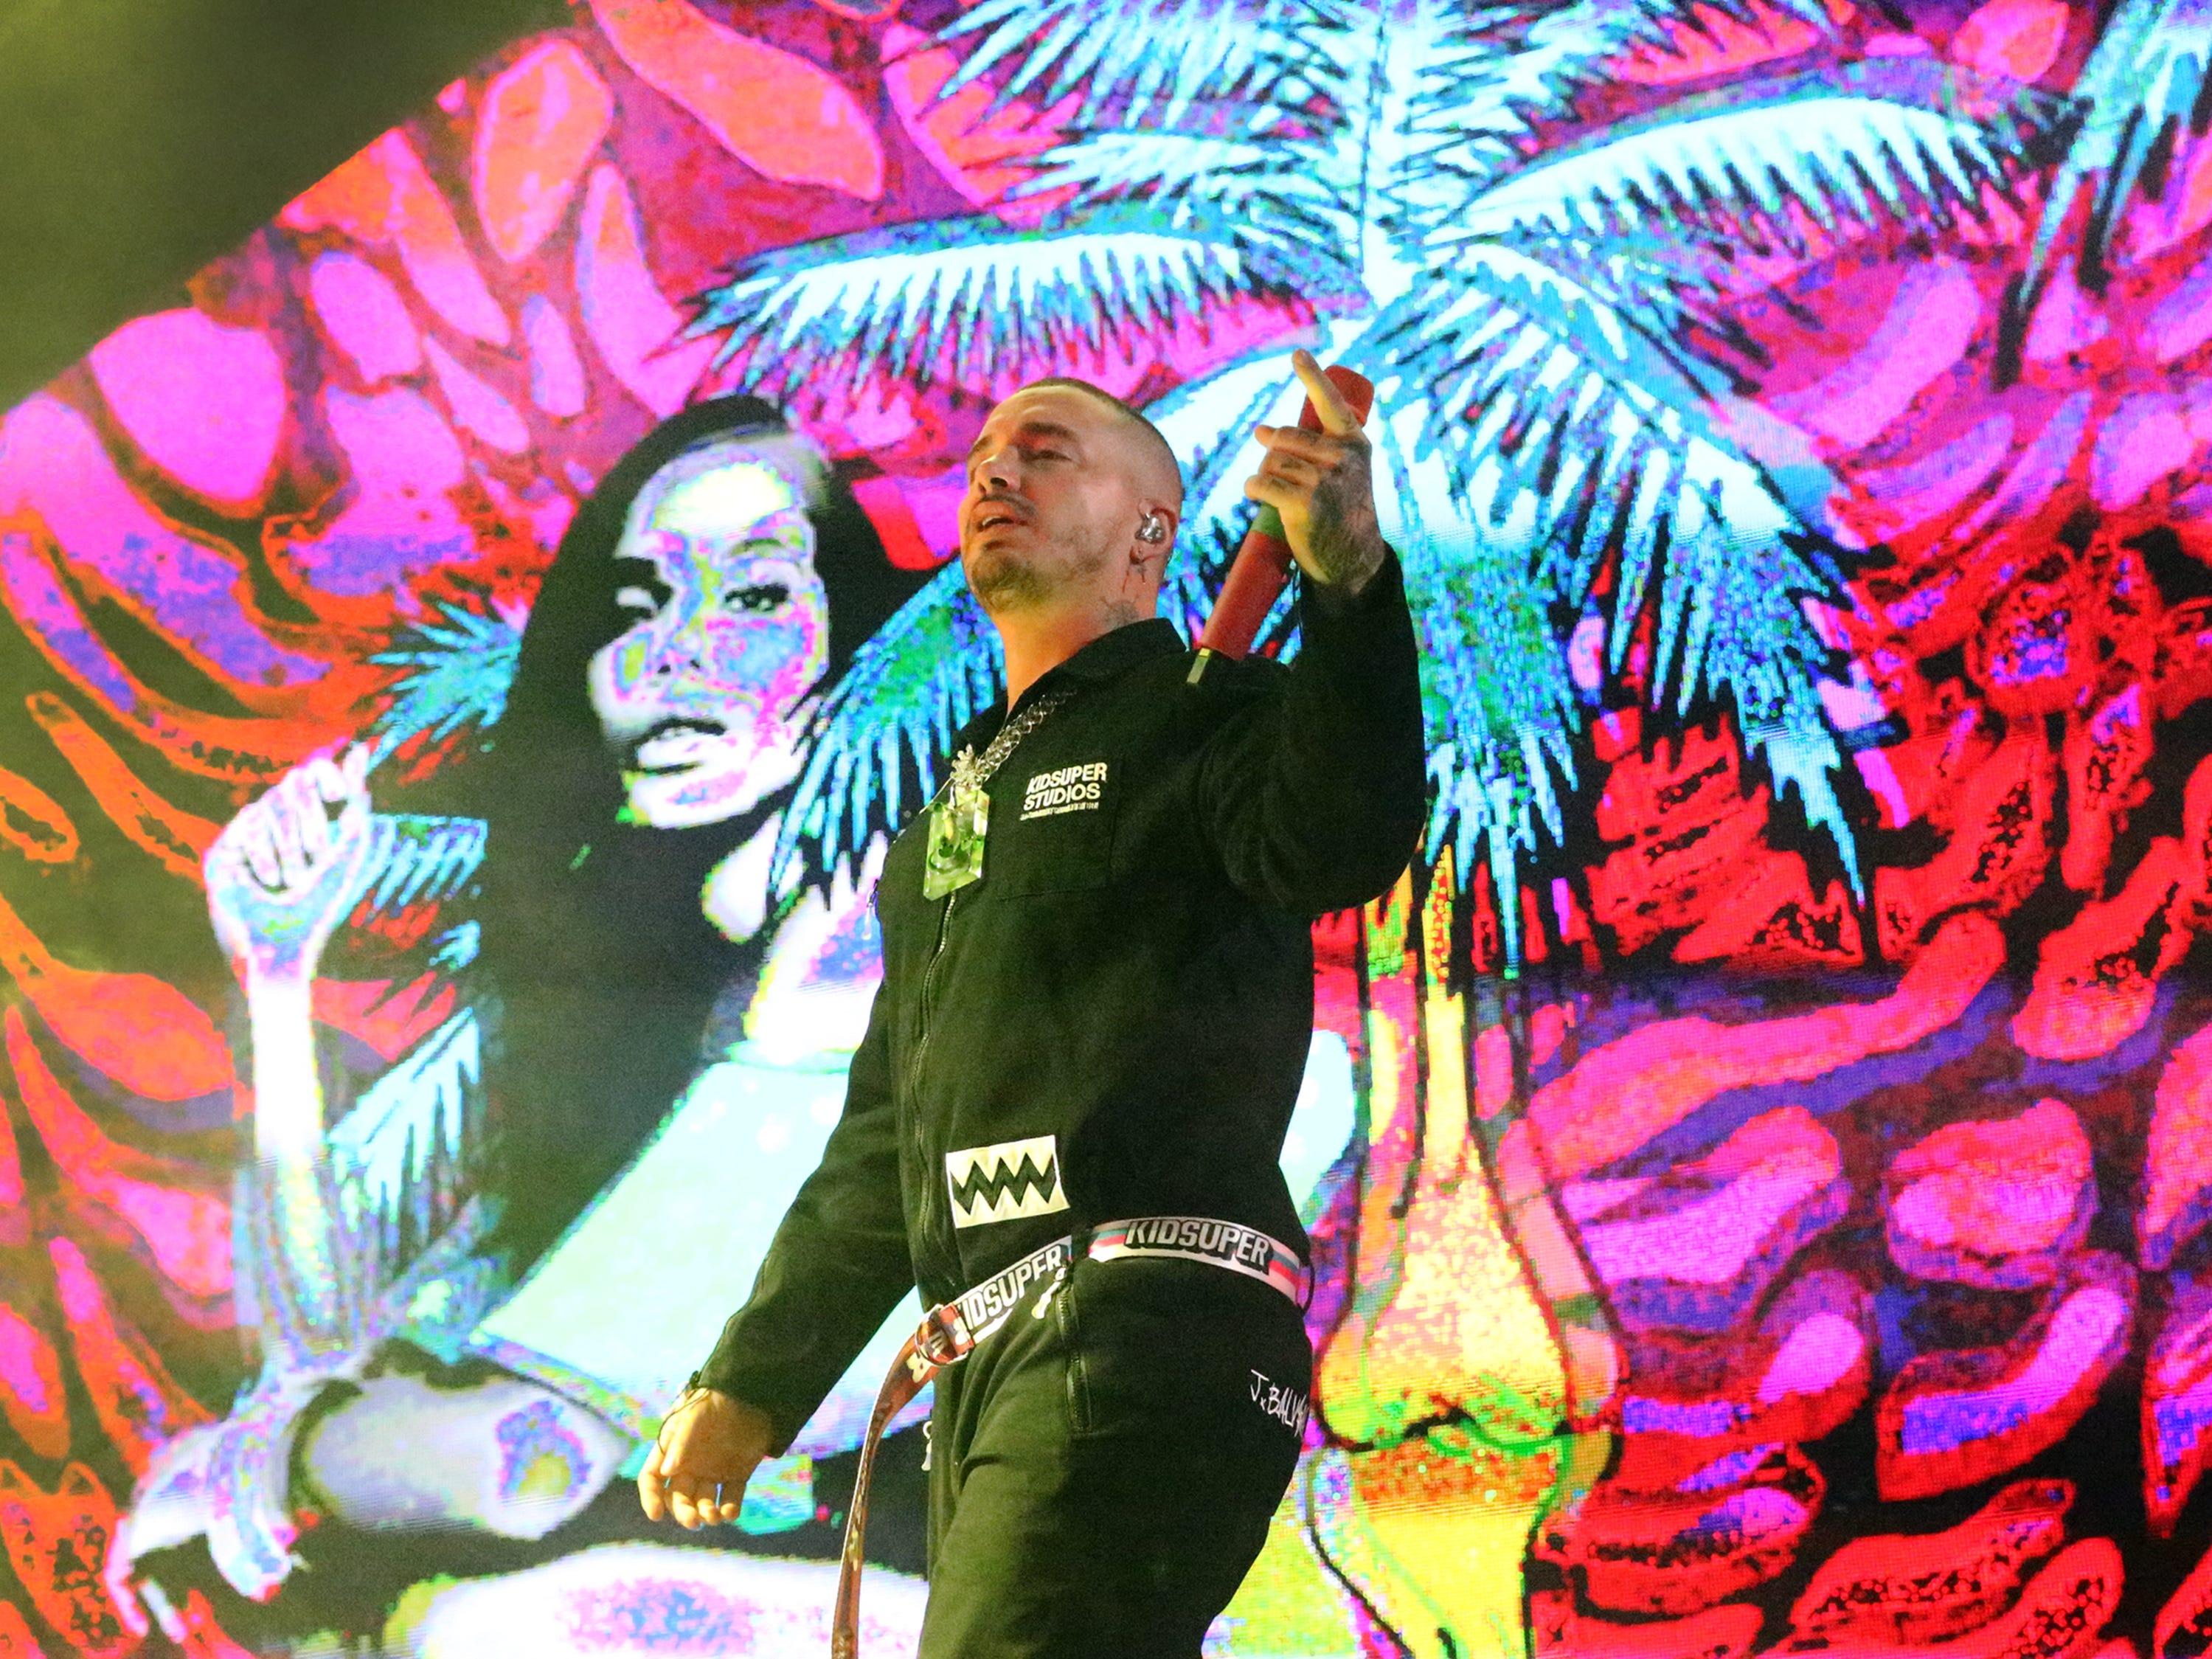 Reggaeton singer J Balvin on stage during his Sunday night show at the Don Haskins Center.